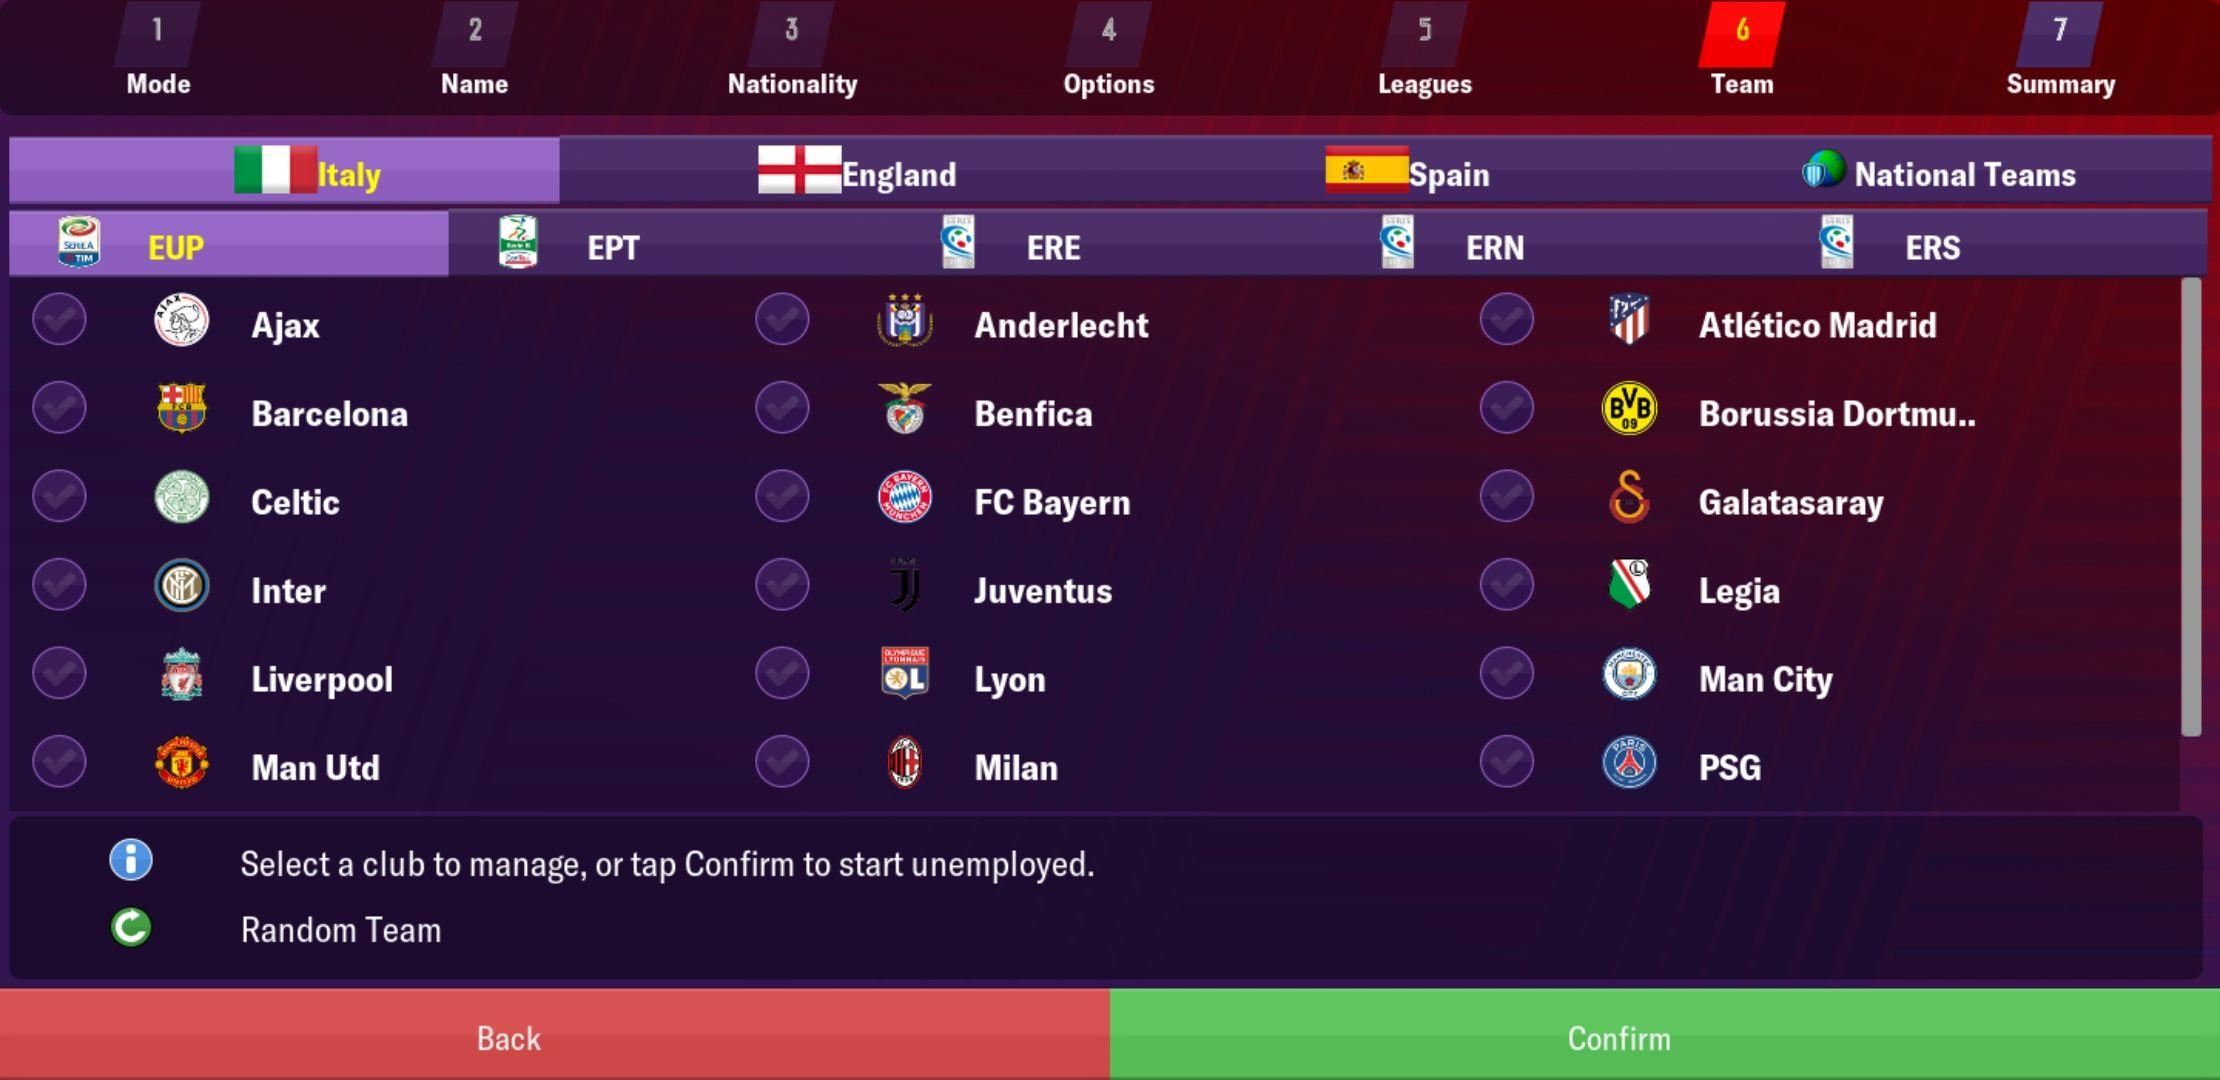 European Super League - Football Manager 2019 Mobile - FMM Vibe